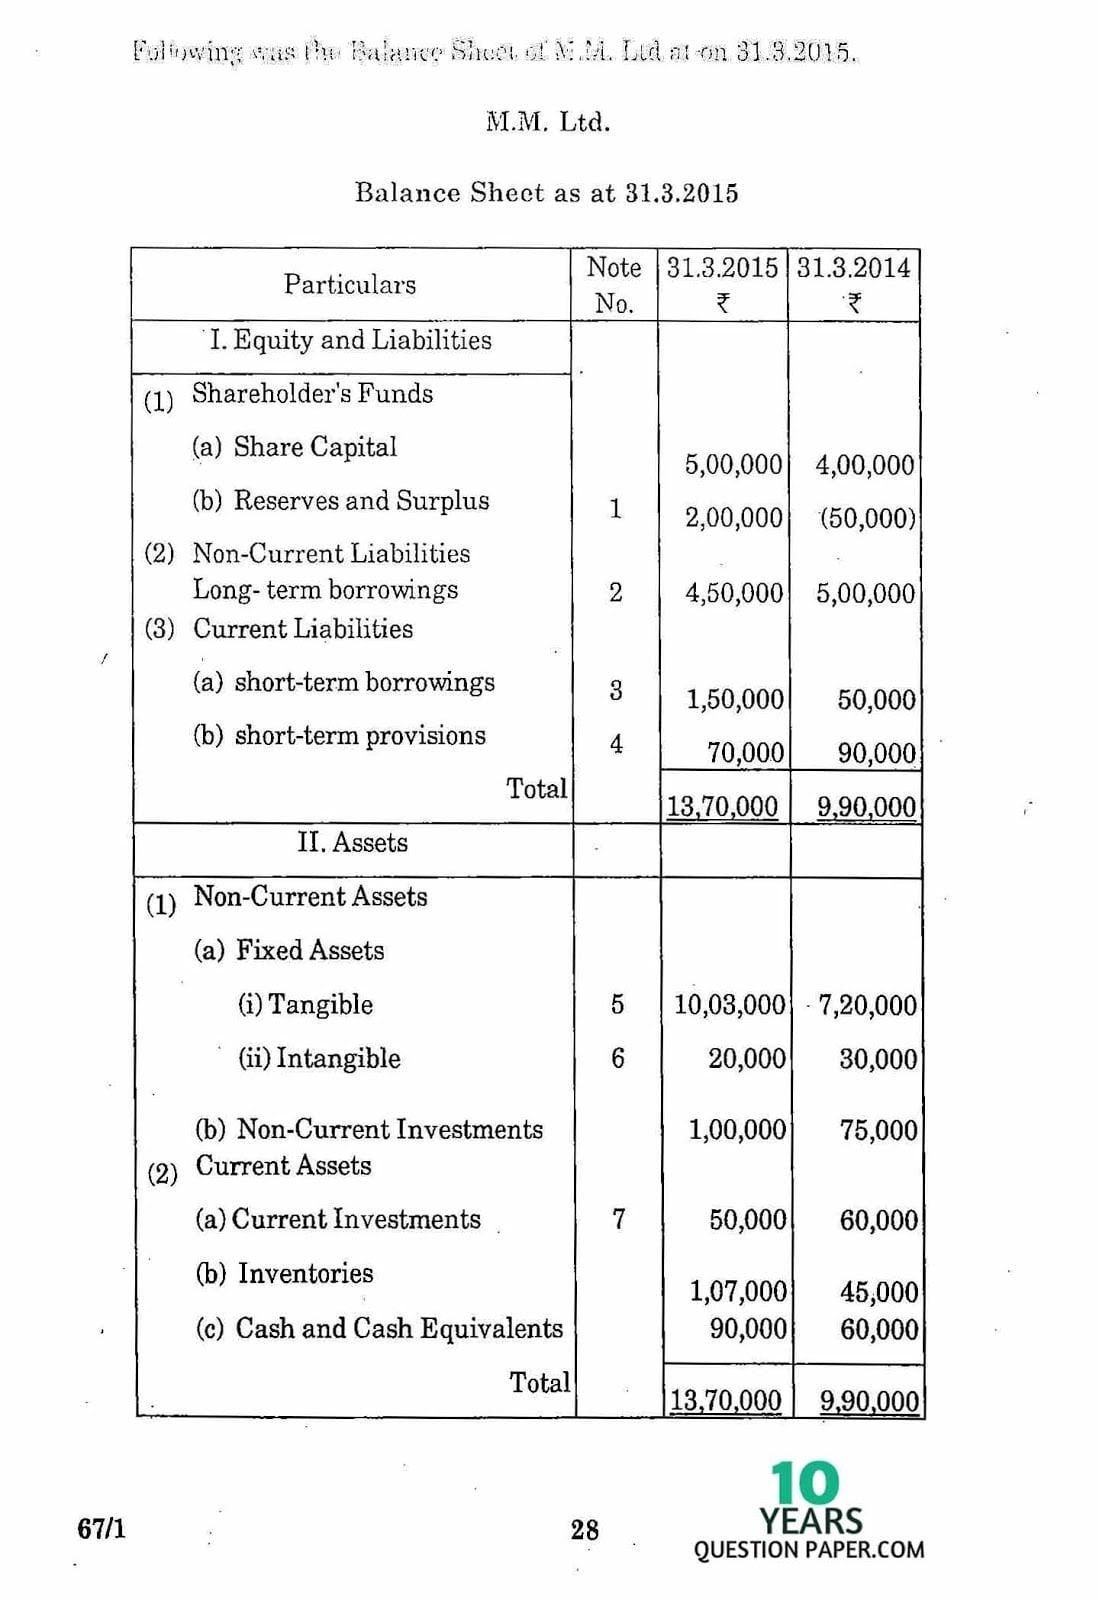 CBSE Class 12 Accountancy 2016 Question Paper